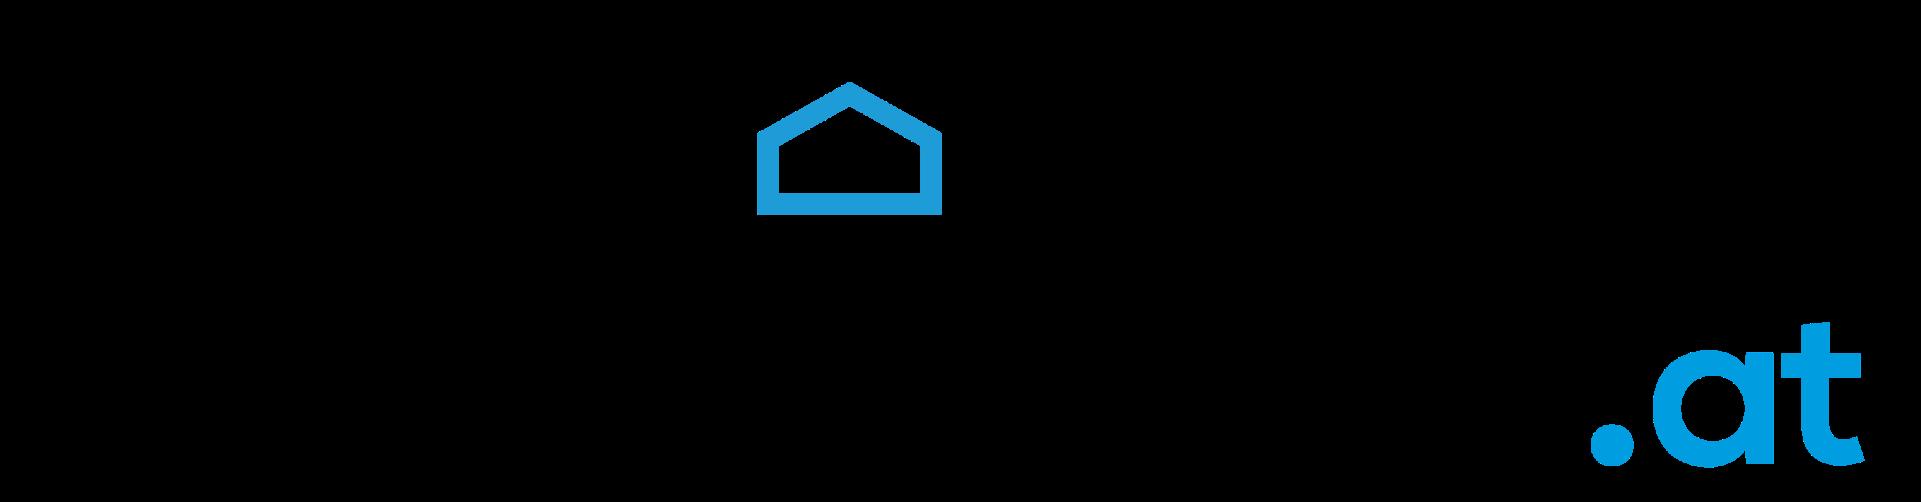 logo_Lehrbetrieb_.png